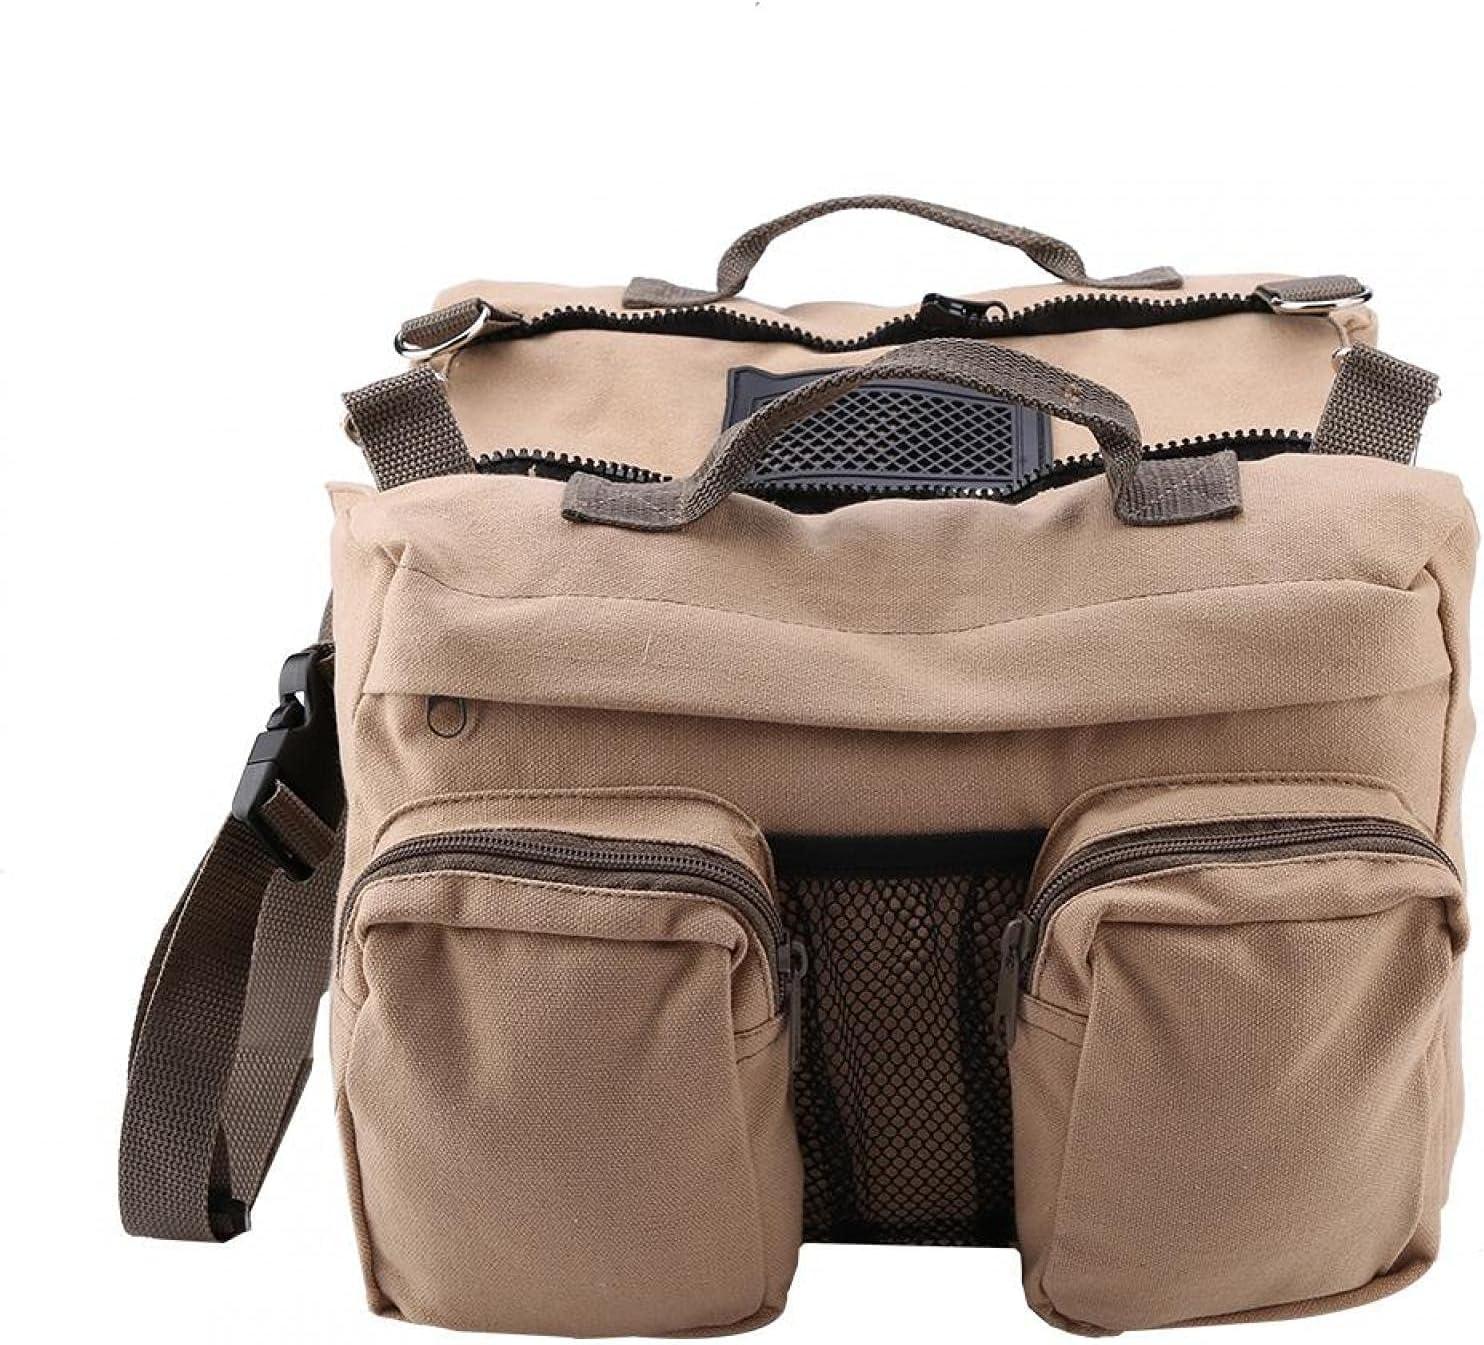 favorite Cloudbox Pet Pack -Cotton Canvas Camping Hik High quality Travel Dog